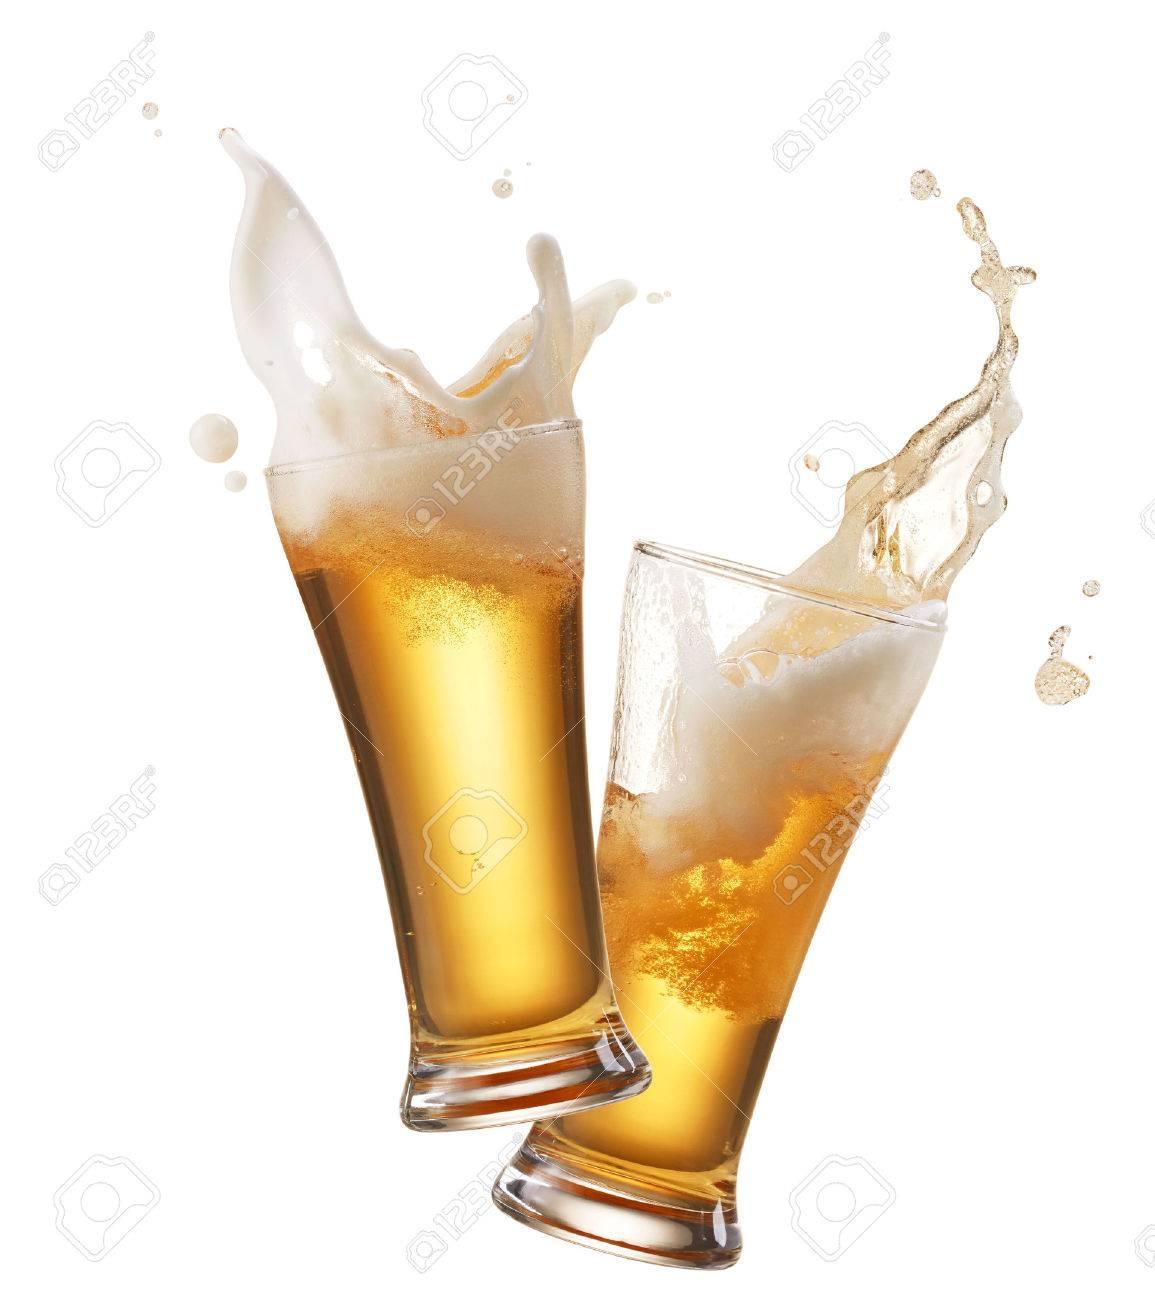 two glasses of beer toasting creating splash - 49136299